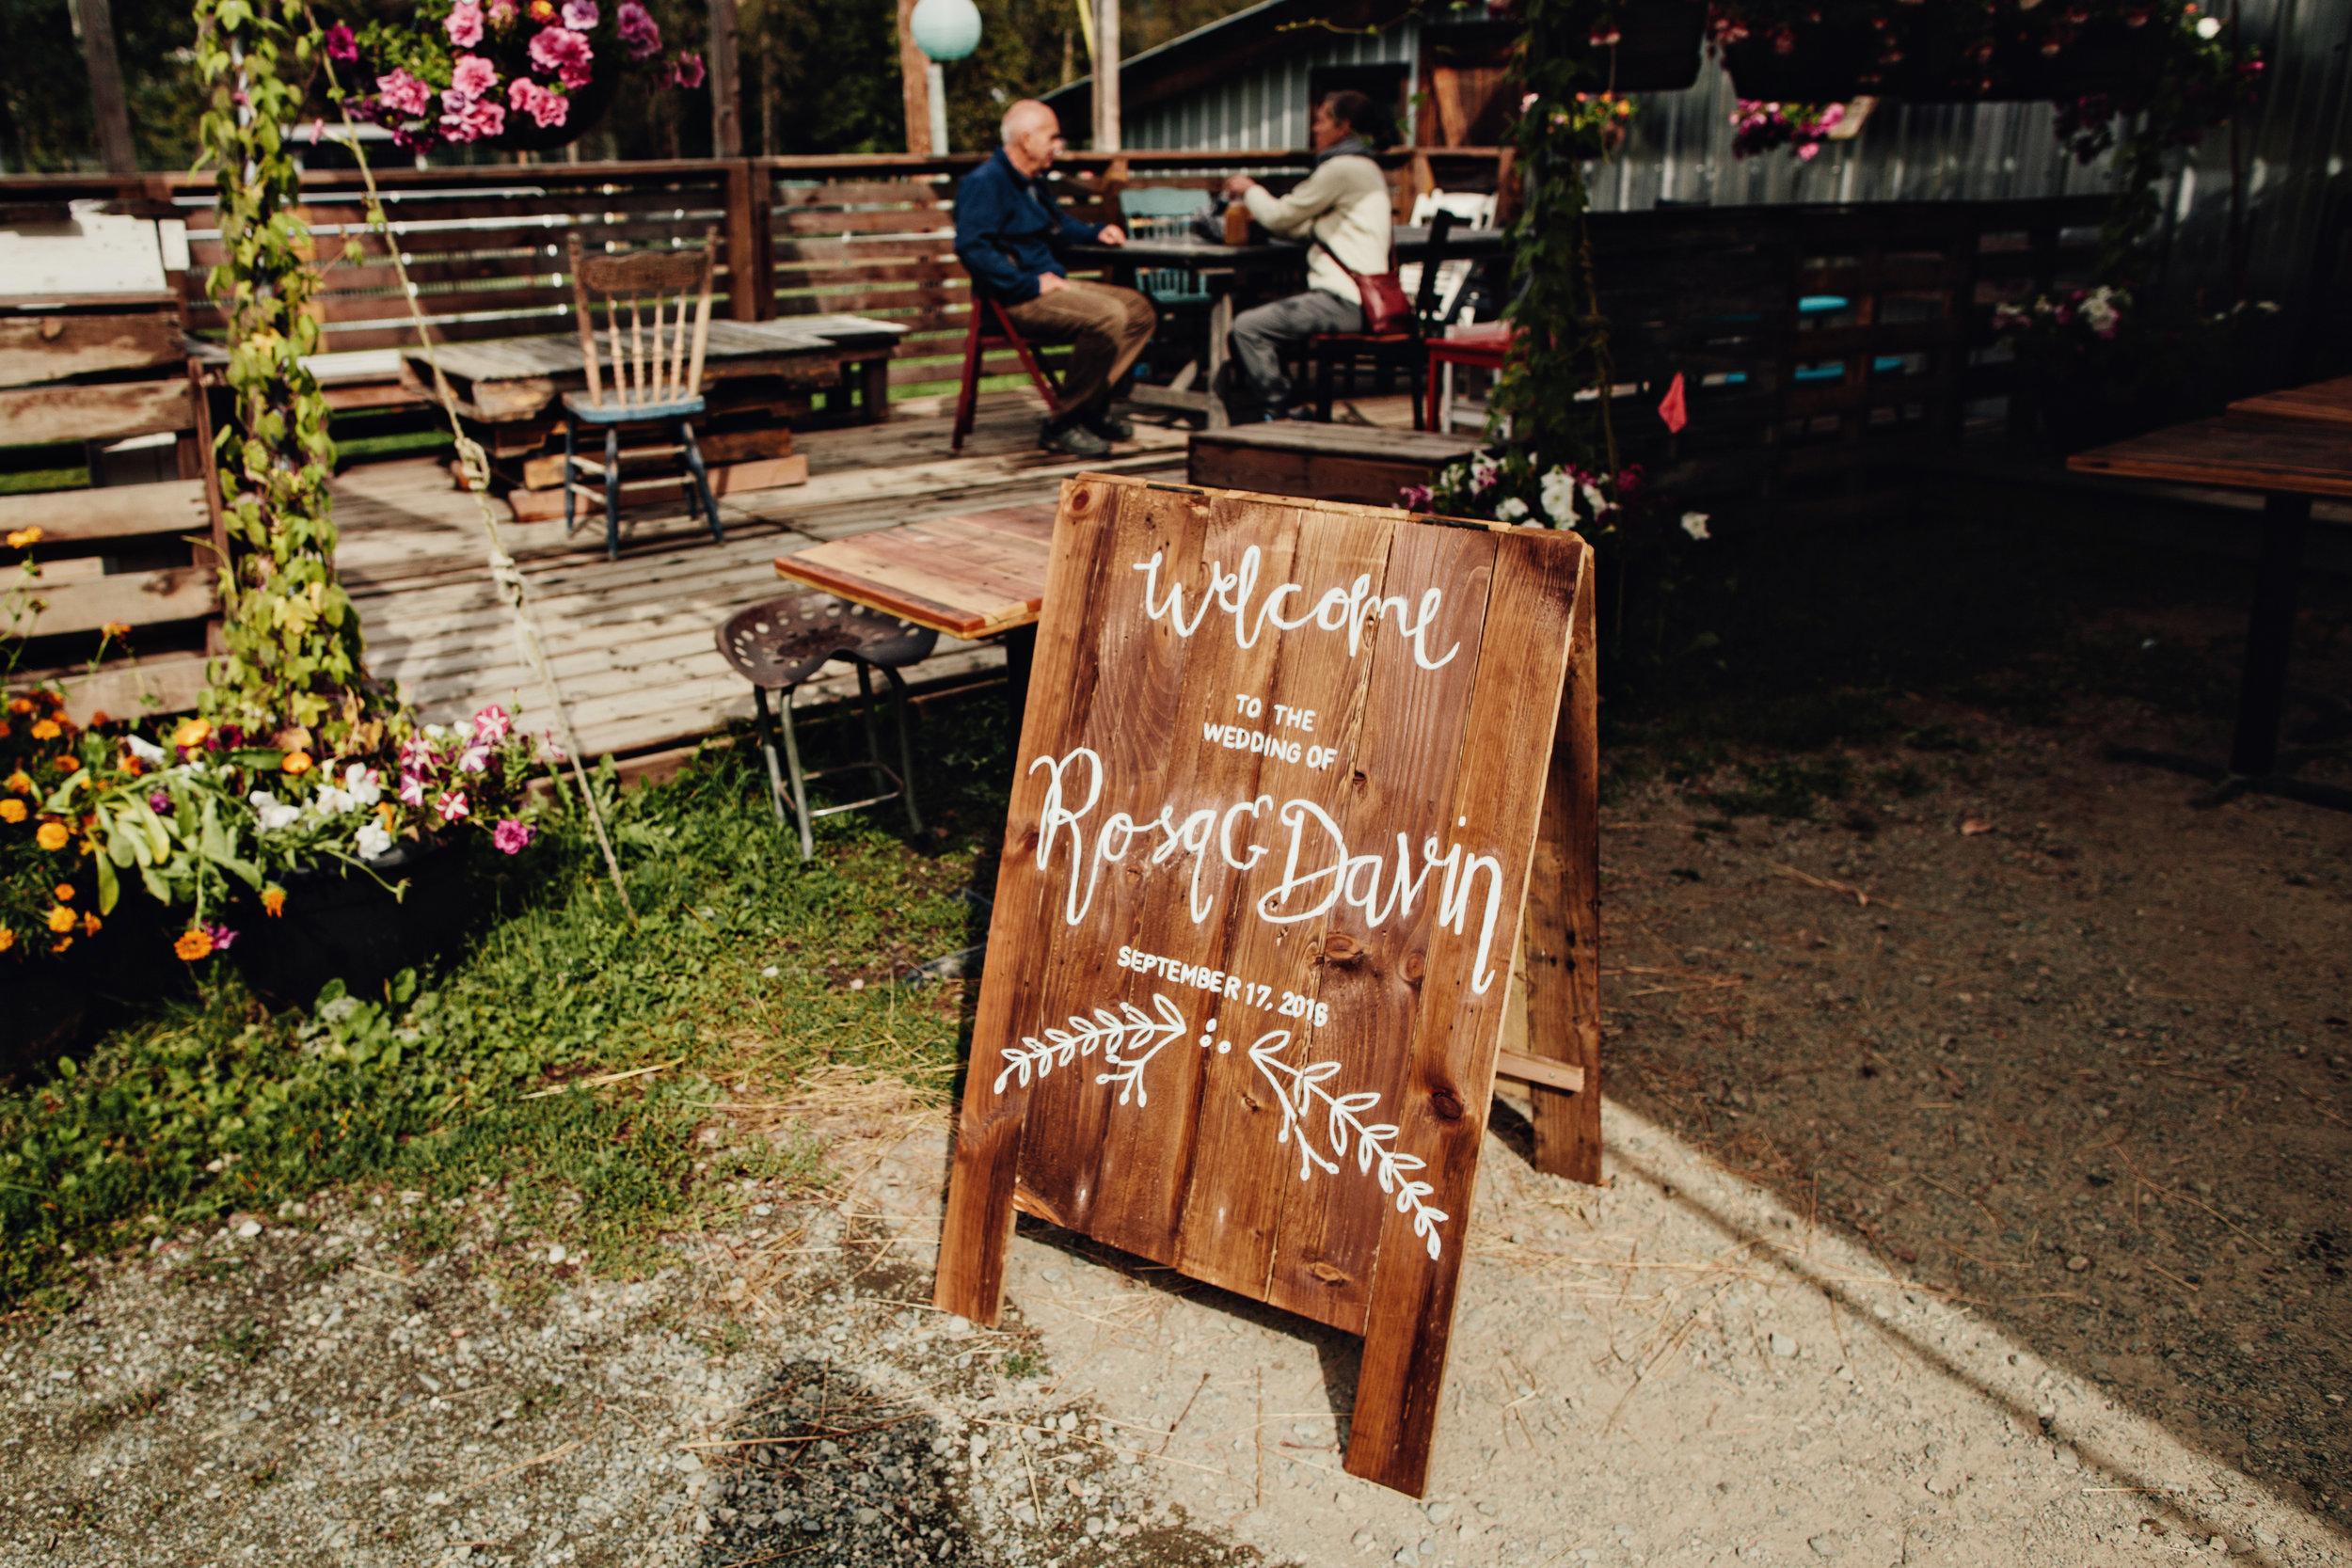 Rosa-Davin-Wedding-0358.JPG